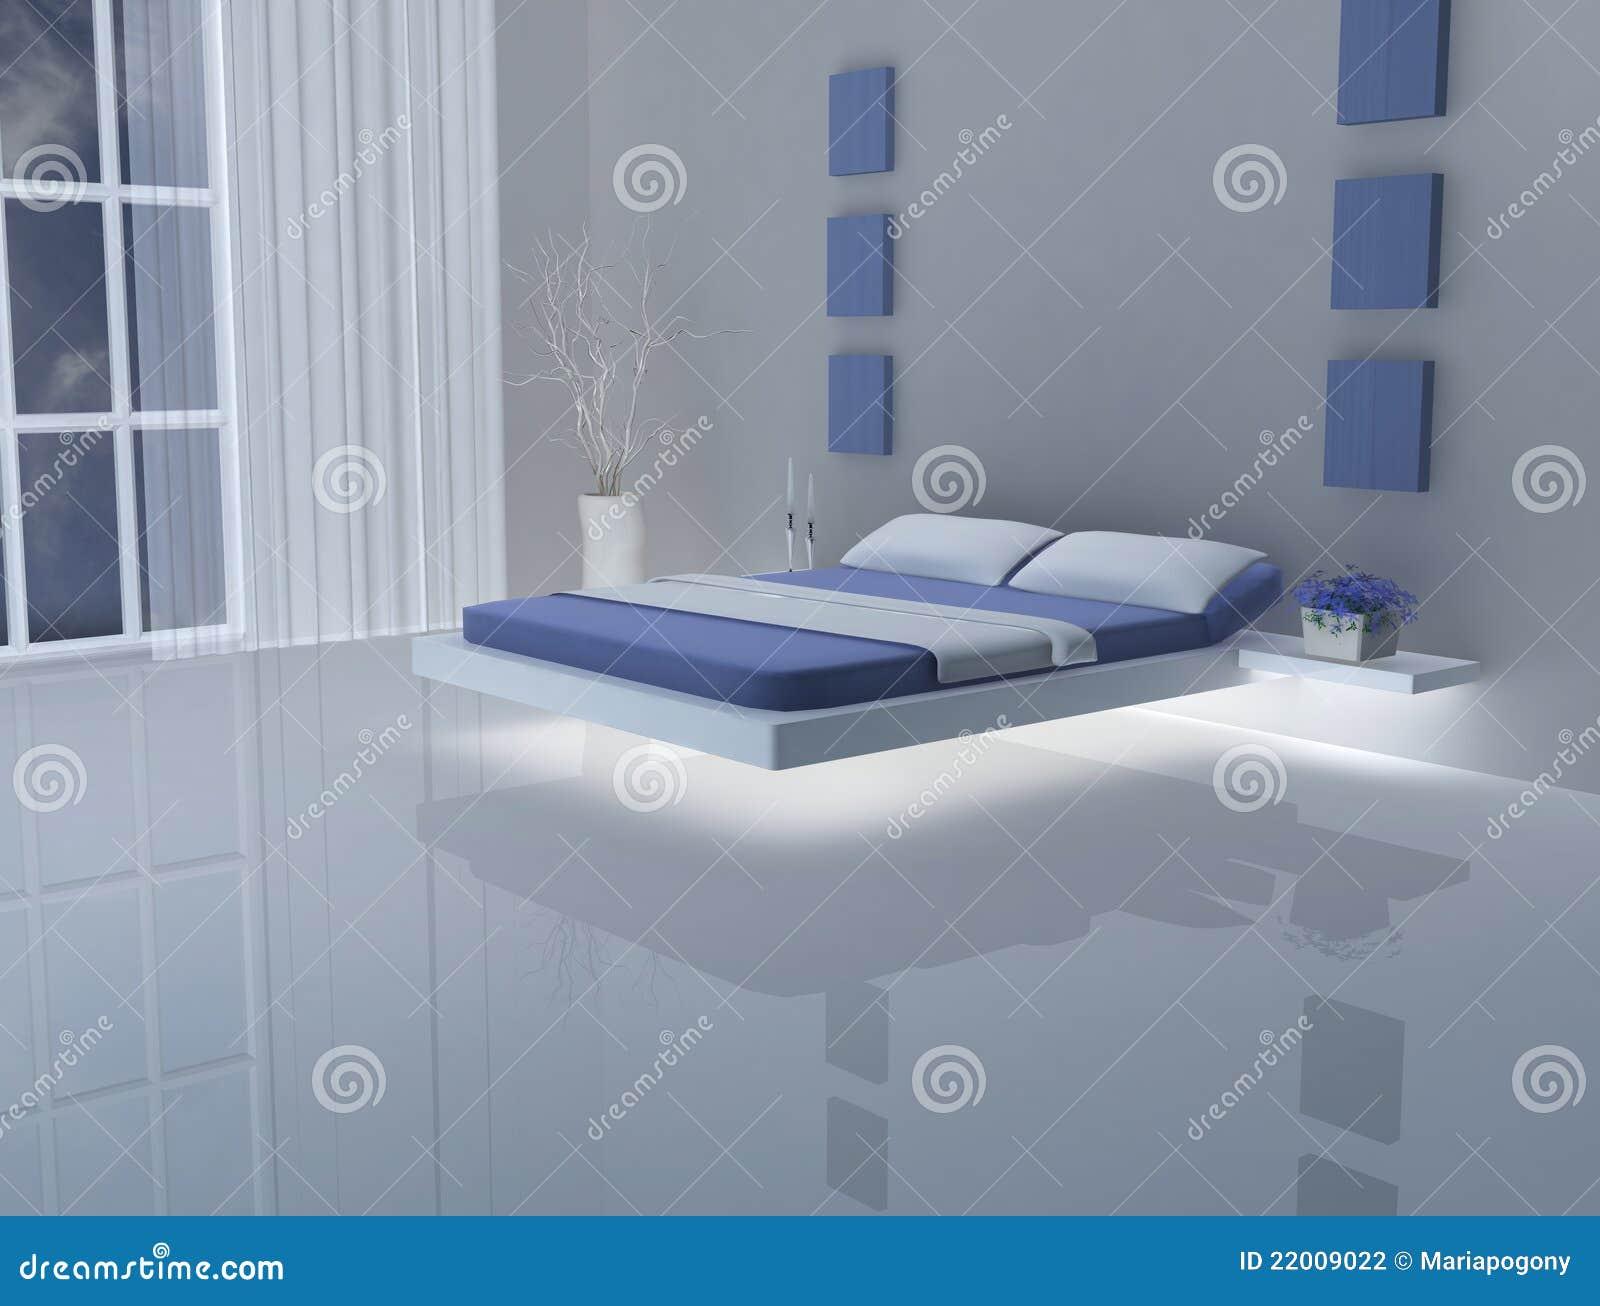 Blauwe Slaapkamer Muur : Blauwe En Witte Slaapkamer Stock Fotografie ...